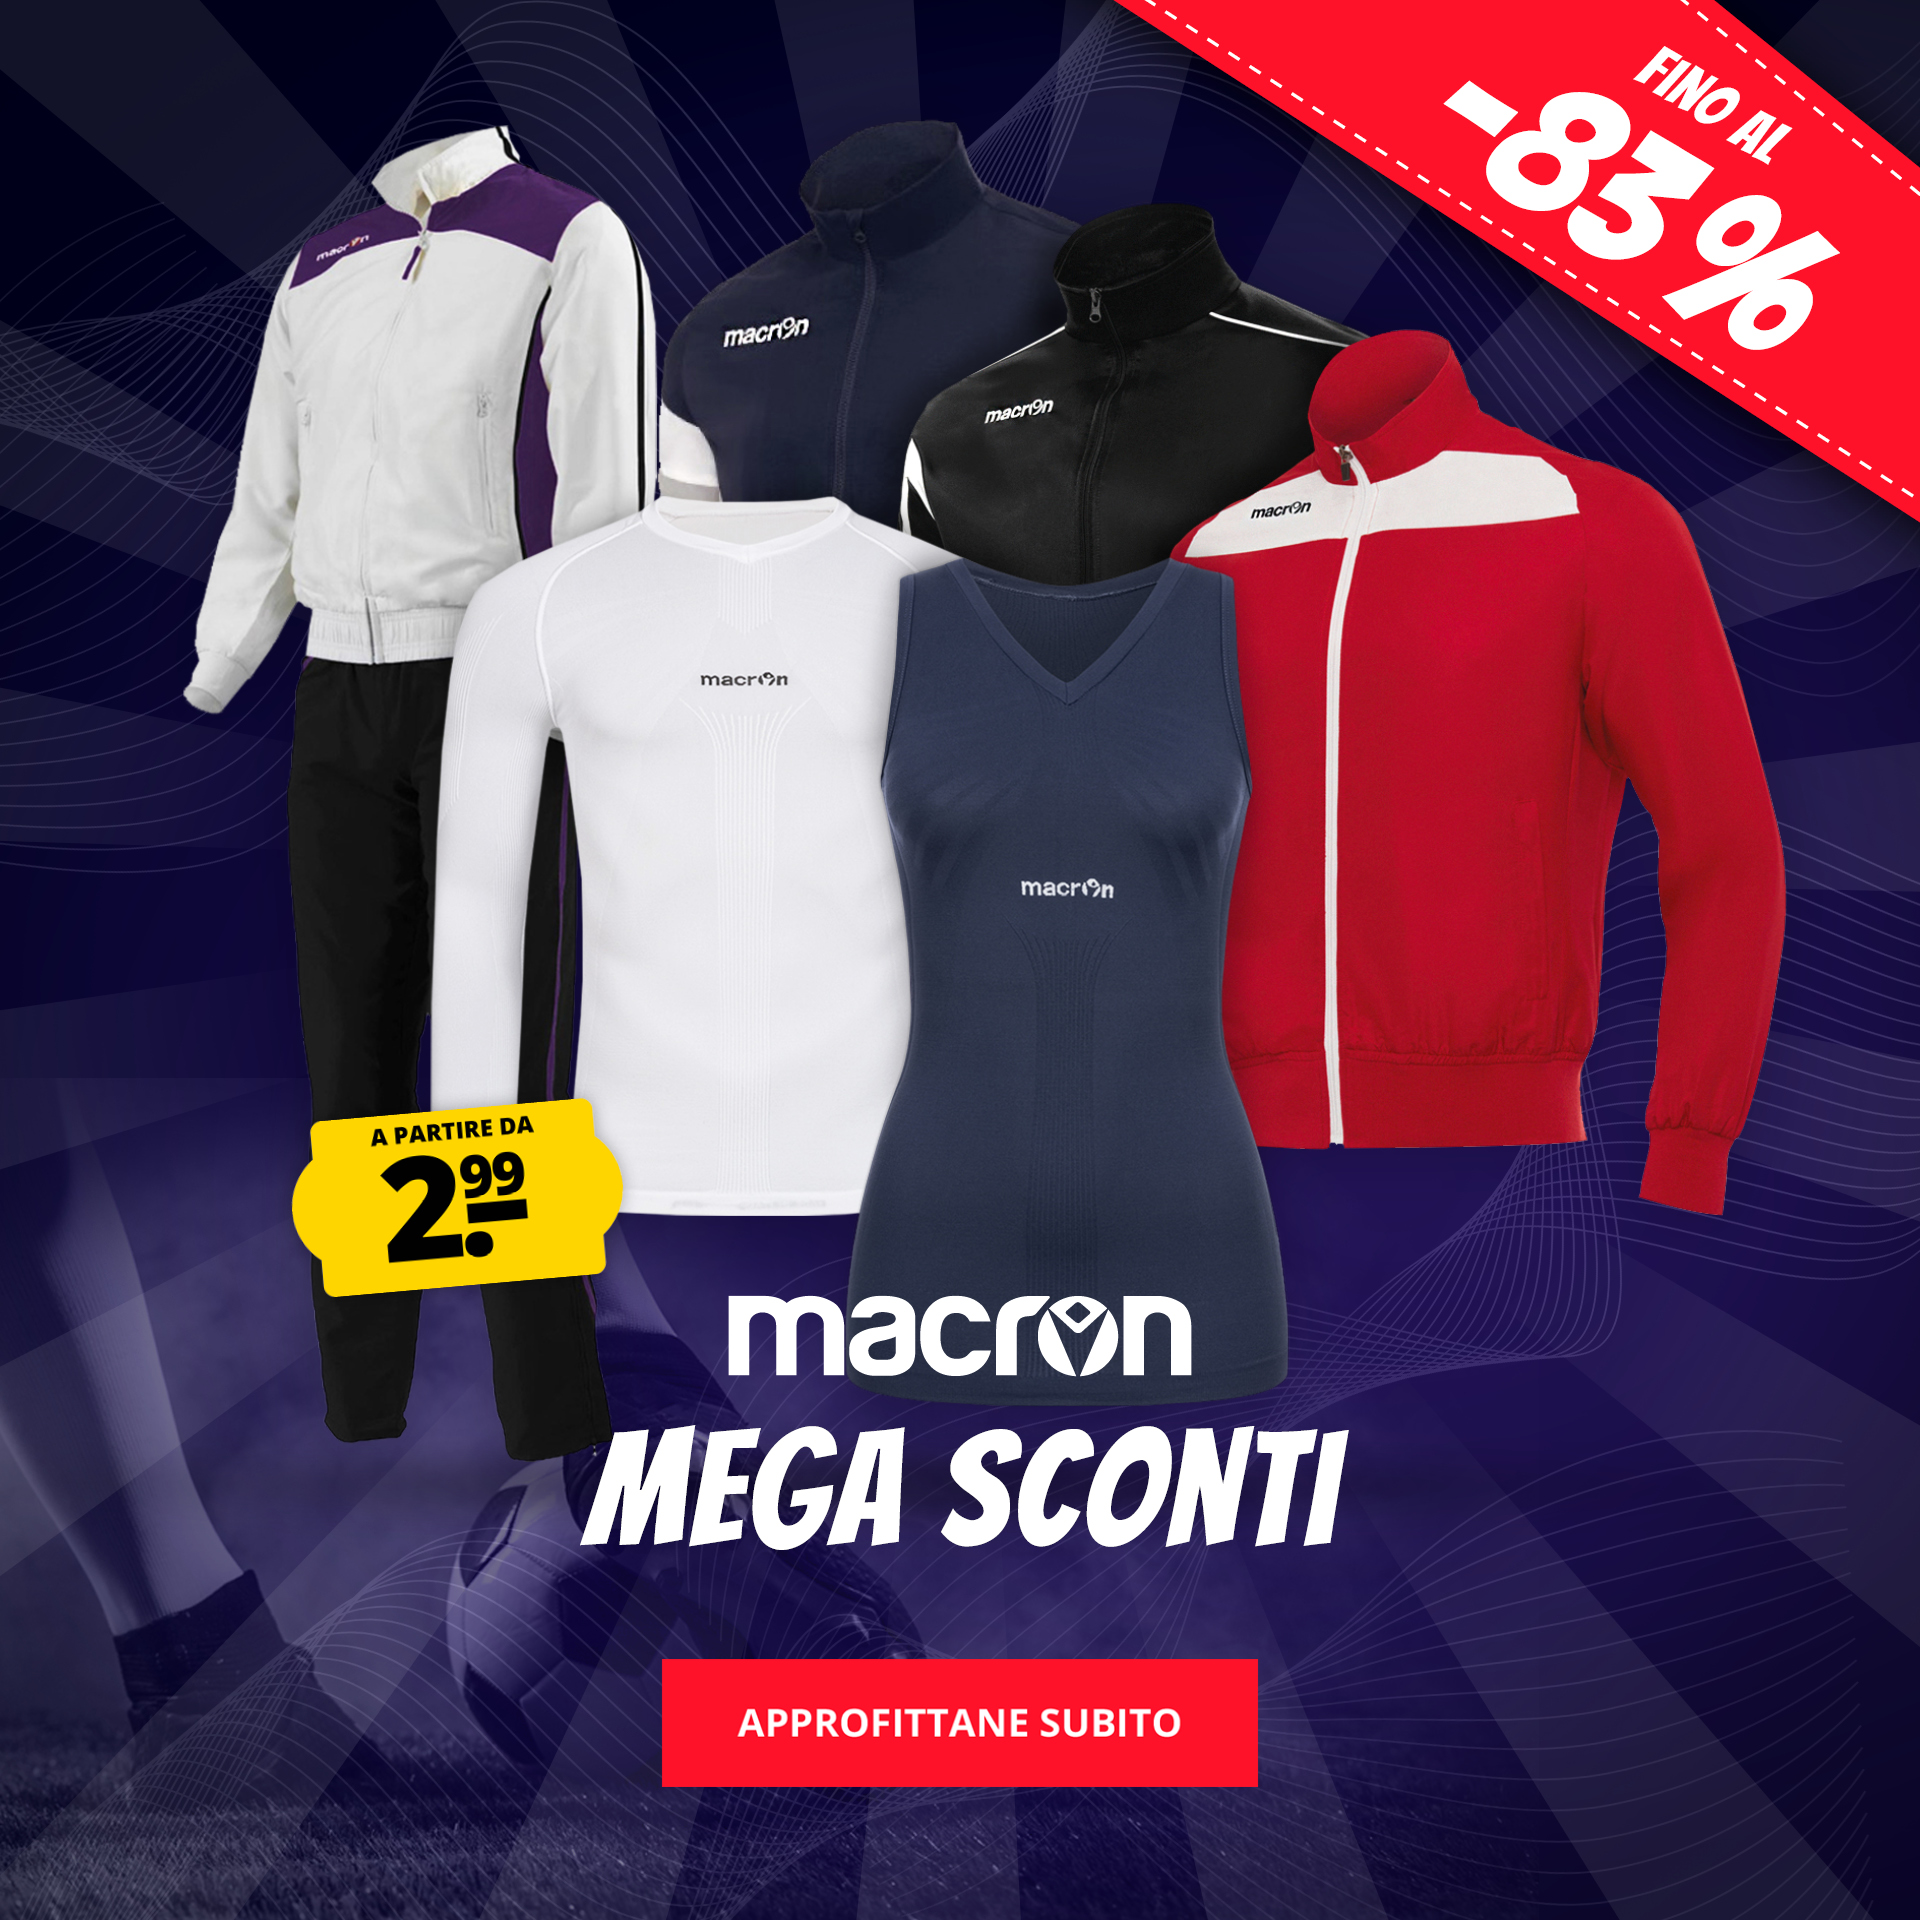 Macron Mega Sconti a partire da 2,99 €